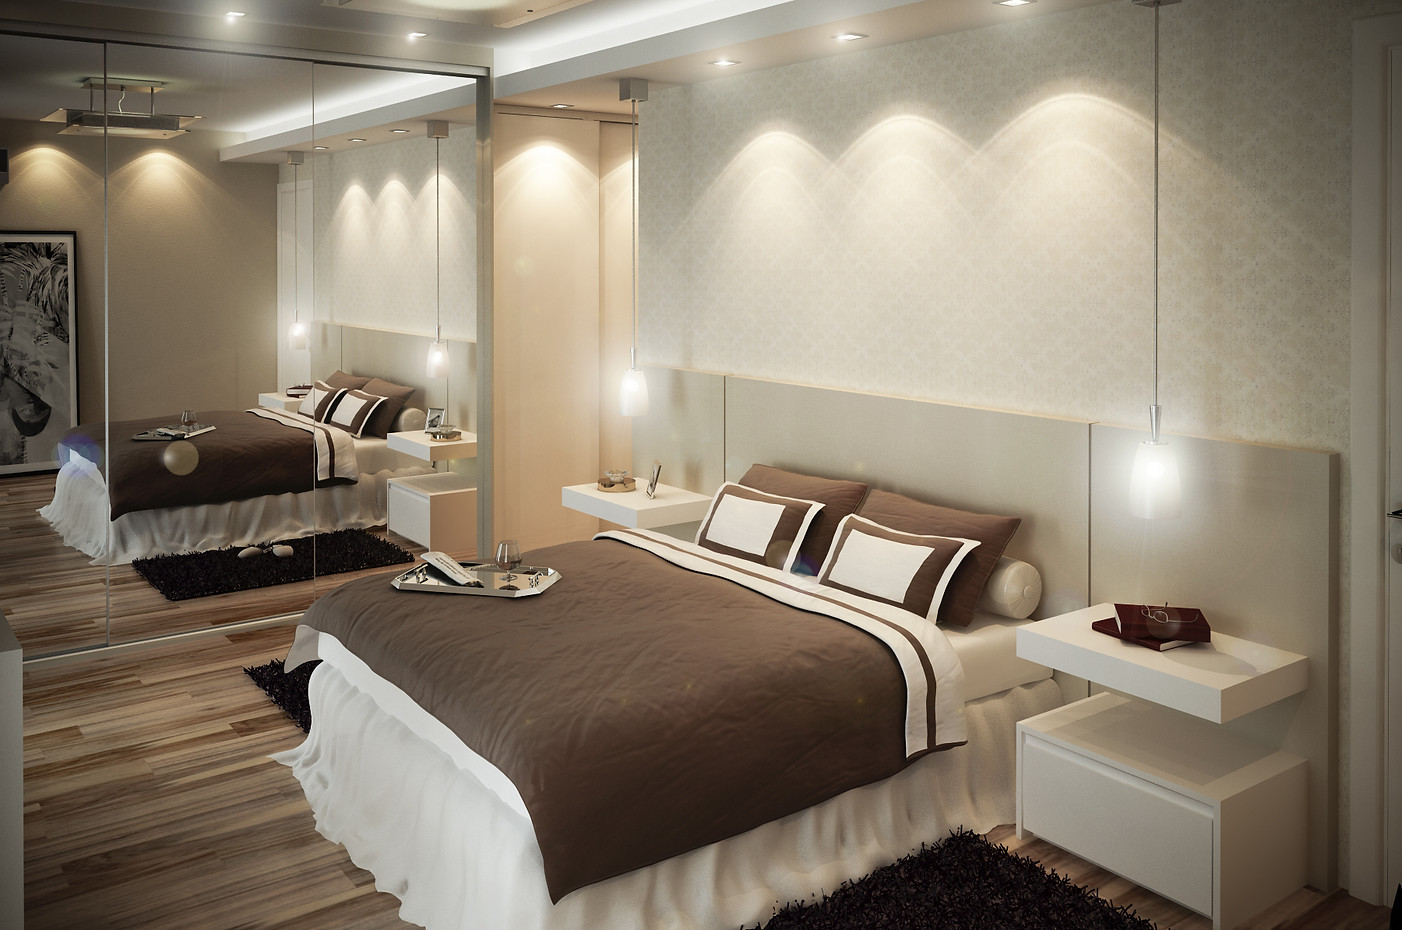 Dormitorio_Sob_Medida_Designinterno_13.j